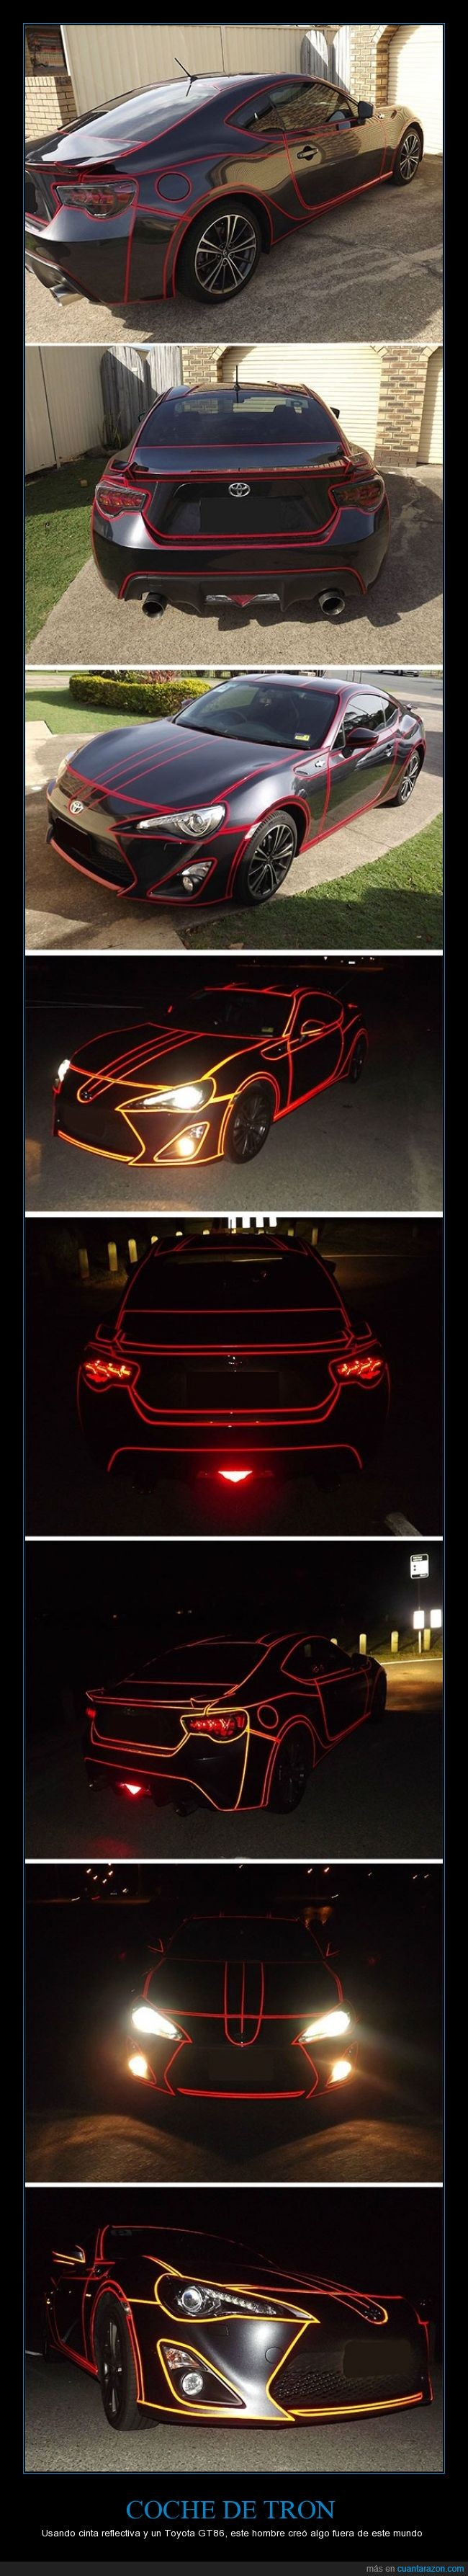 auto,coche,genial,genialidad,gt86,molar,reflectivo,toyota,tron,vinilo